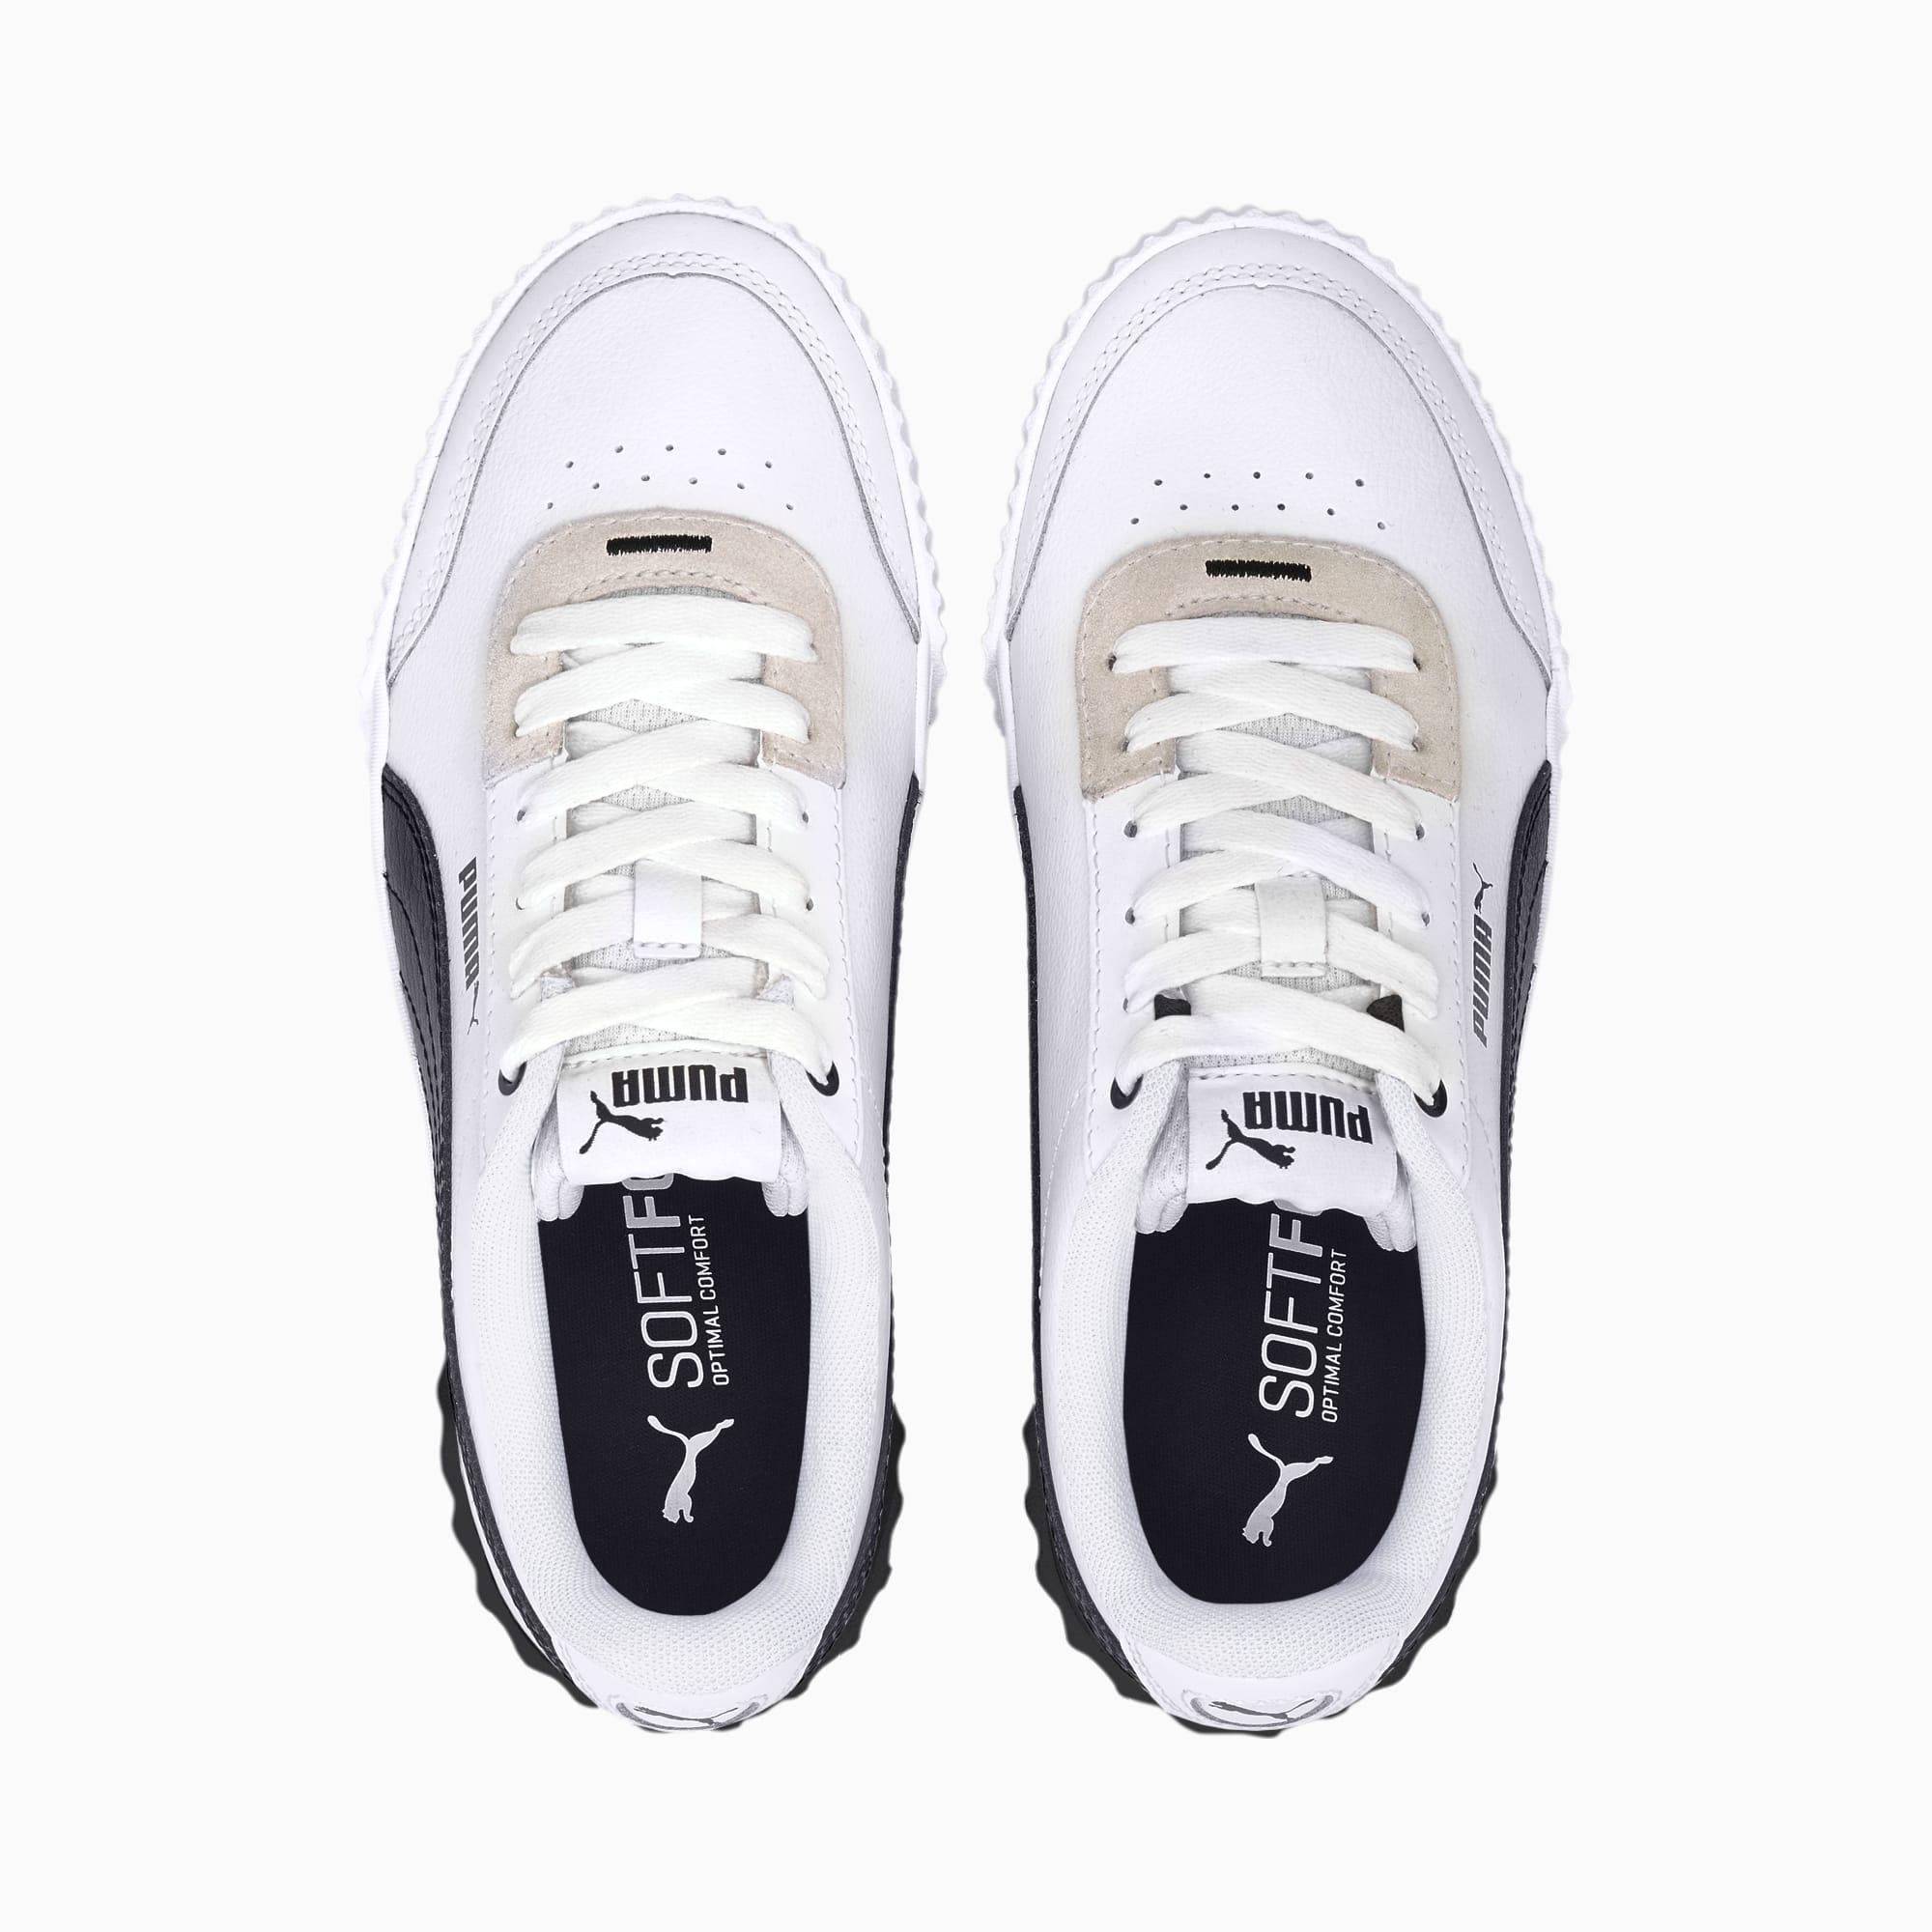 Carina Lift Women's Sneakers